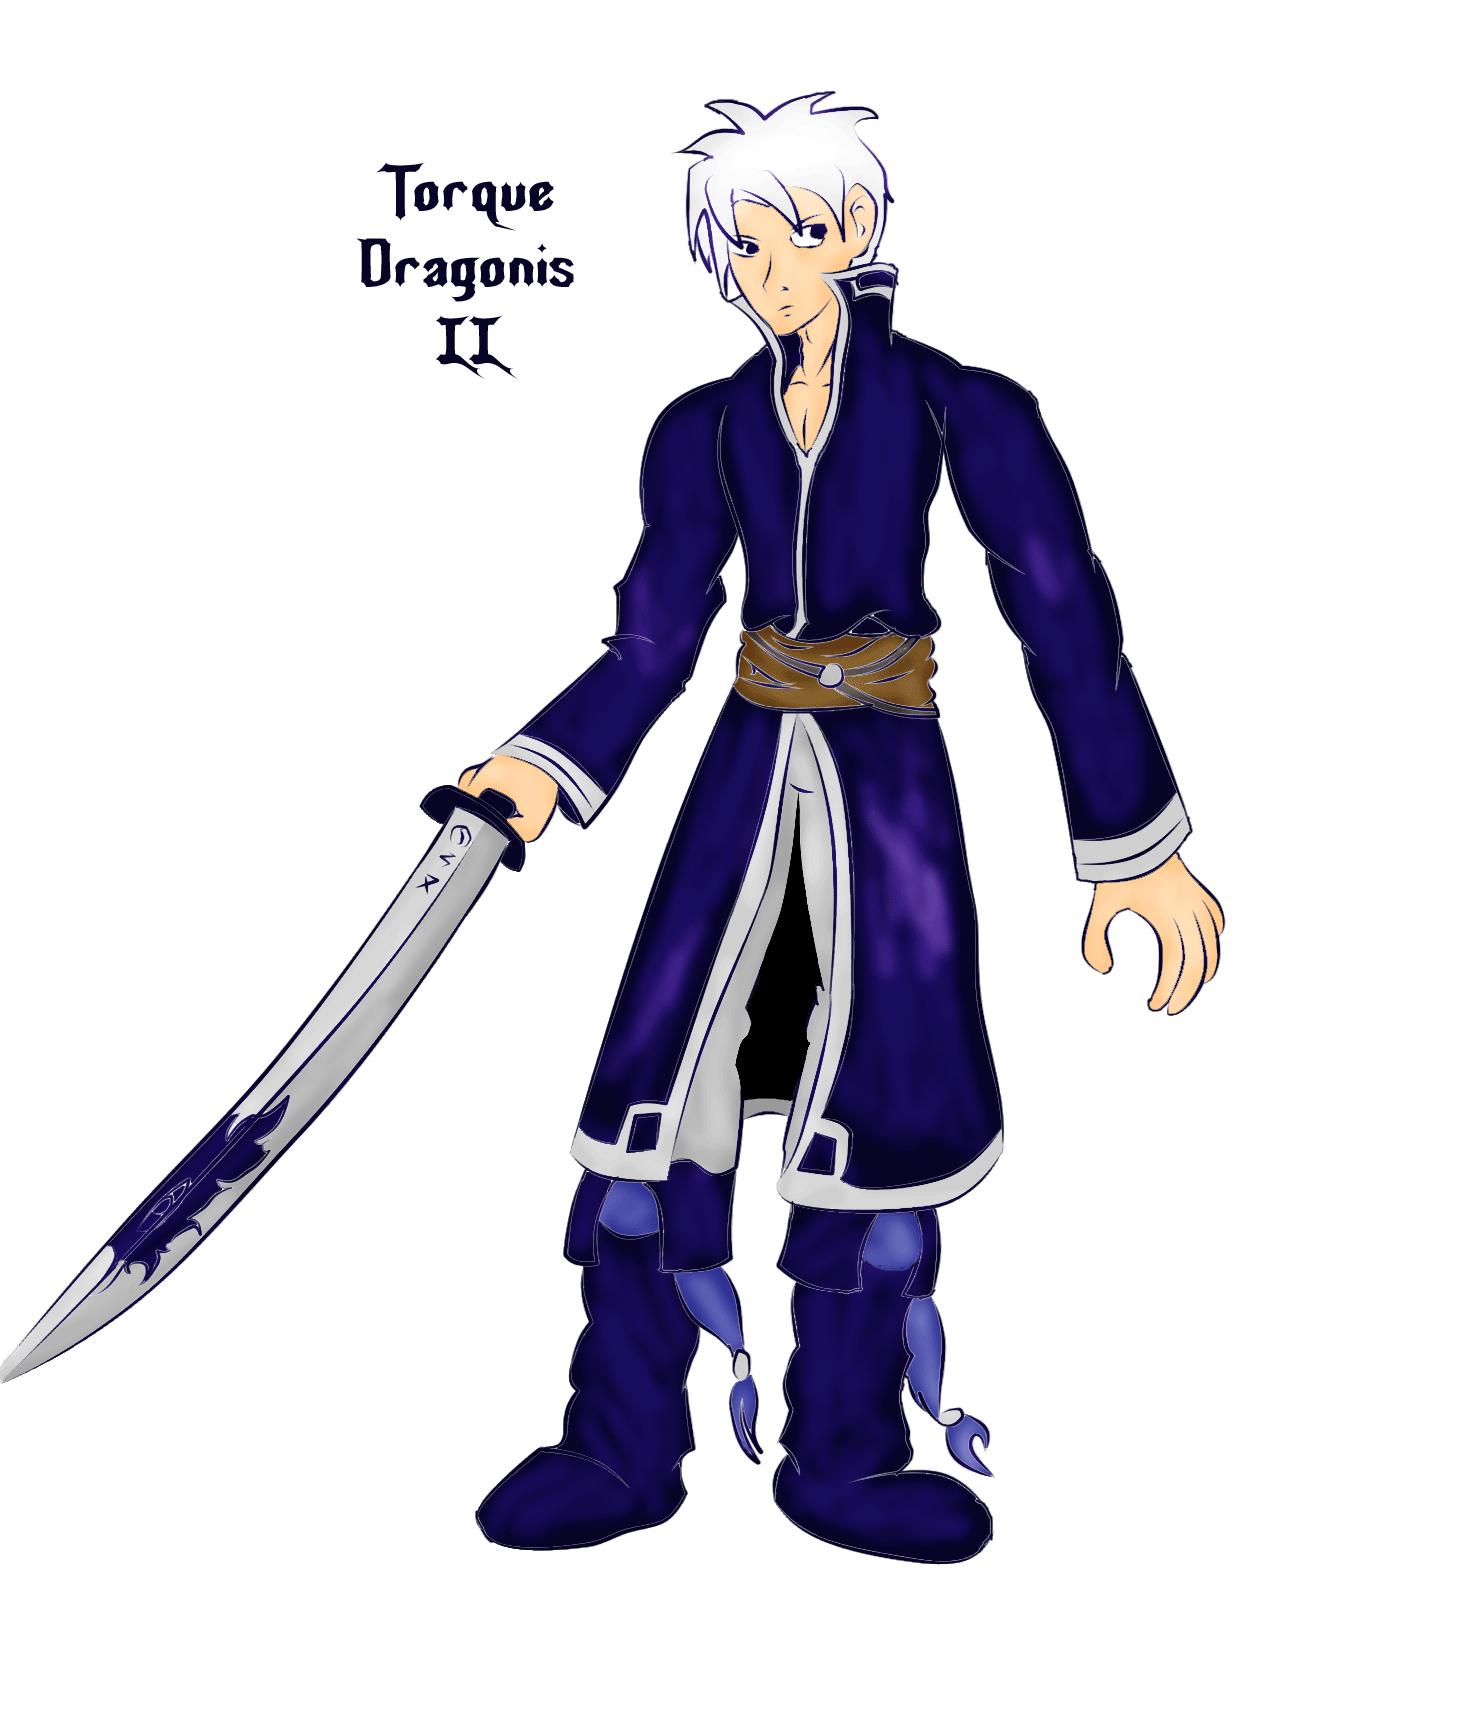 Torque Dragonis II by OnionMan